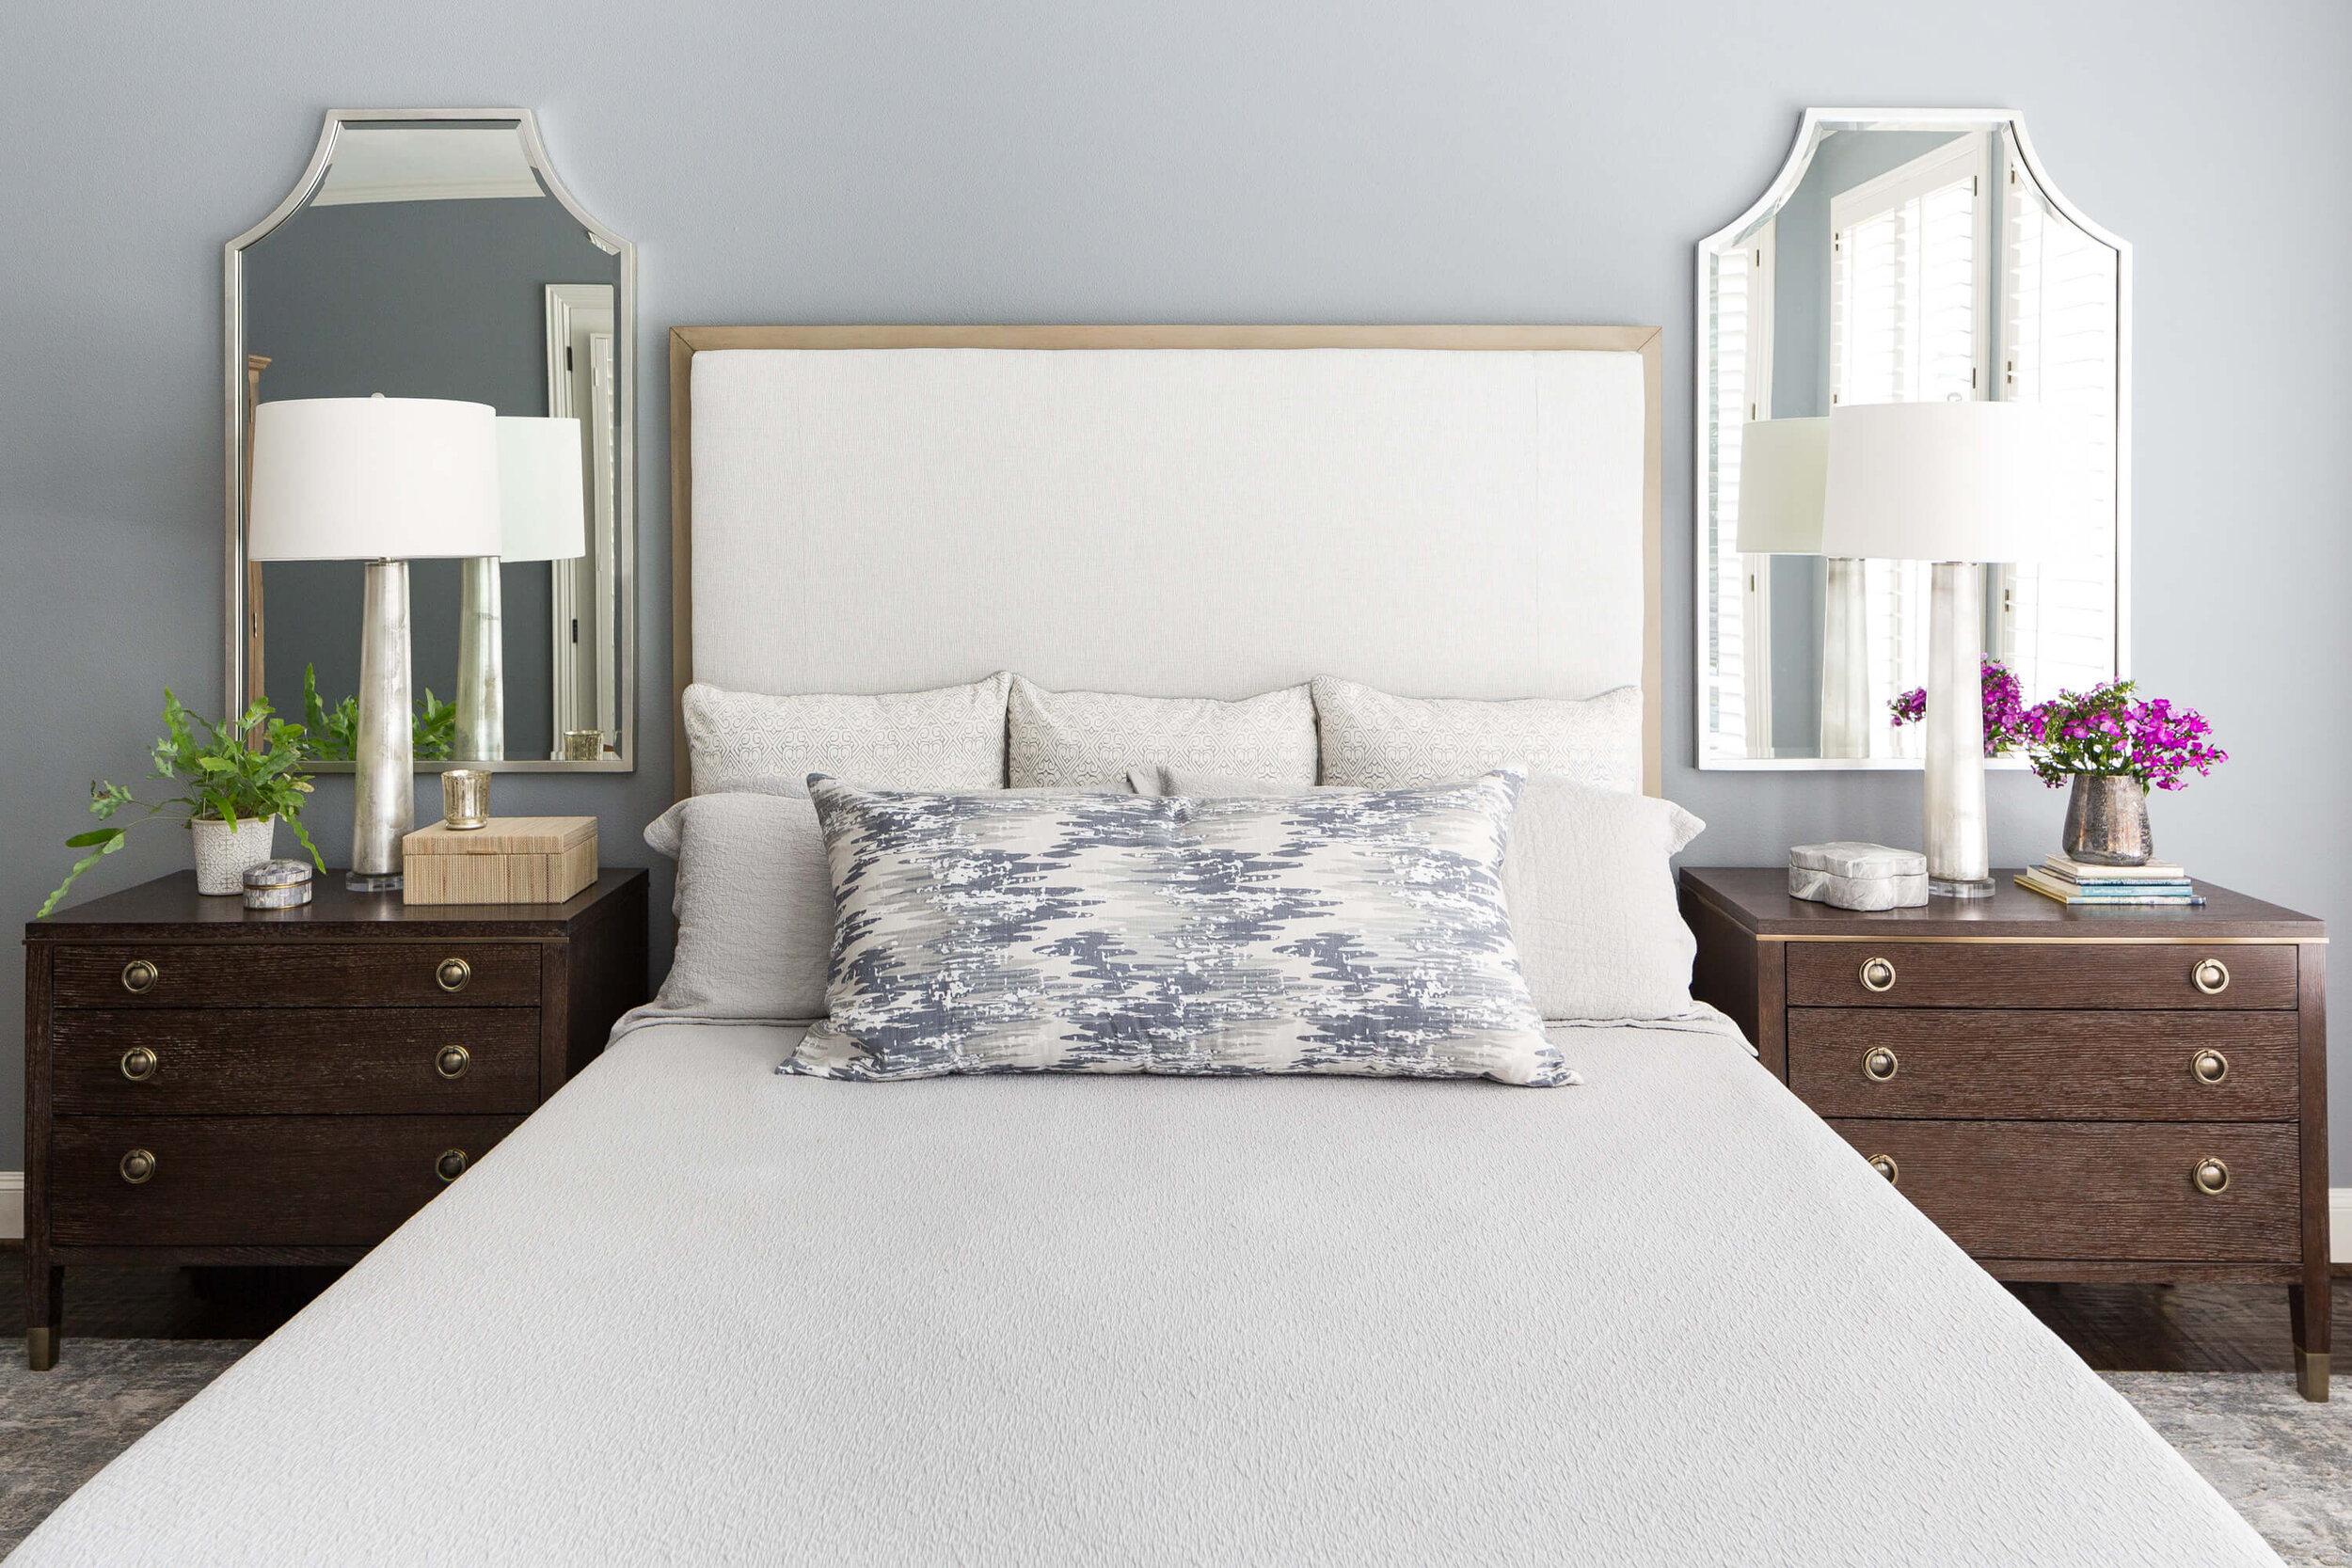 Beautiful bedside decor moments | Designer: Carla Aston, Photo: Colleen Scott | #bedsidetable #bedsidedecor #bedroomdecor #nightstand #nightstanddecor